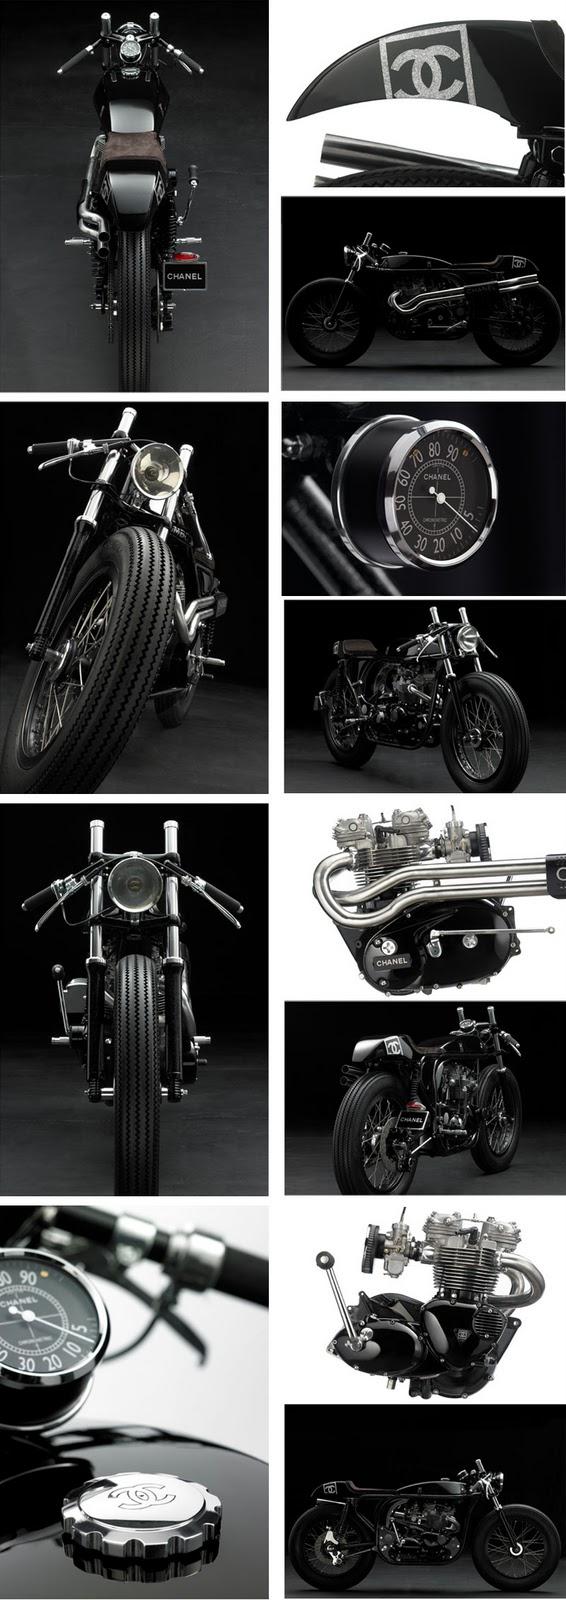 Triton by Daniel Delfour CHANEL-MOTORCYCLE